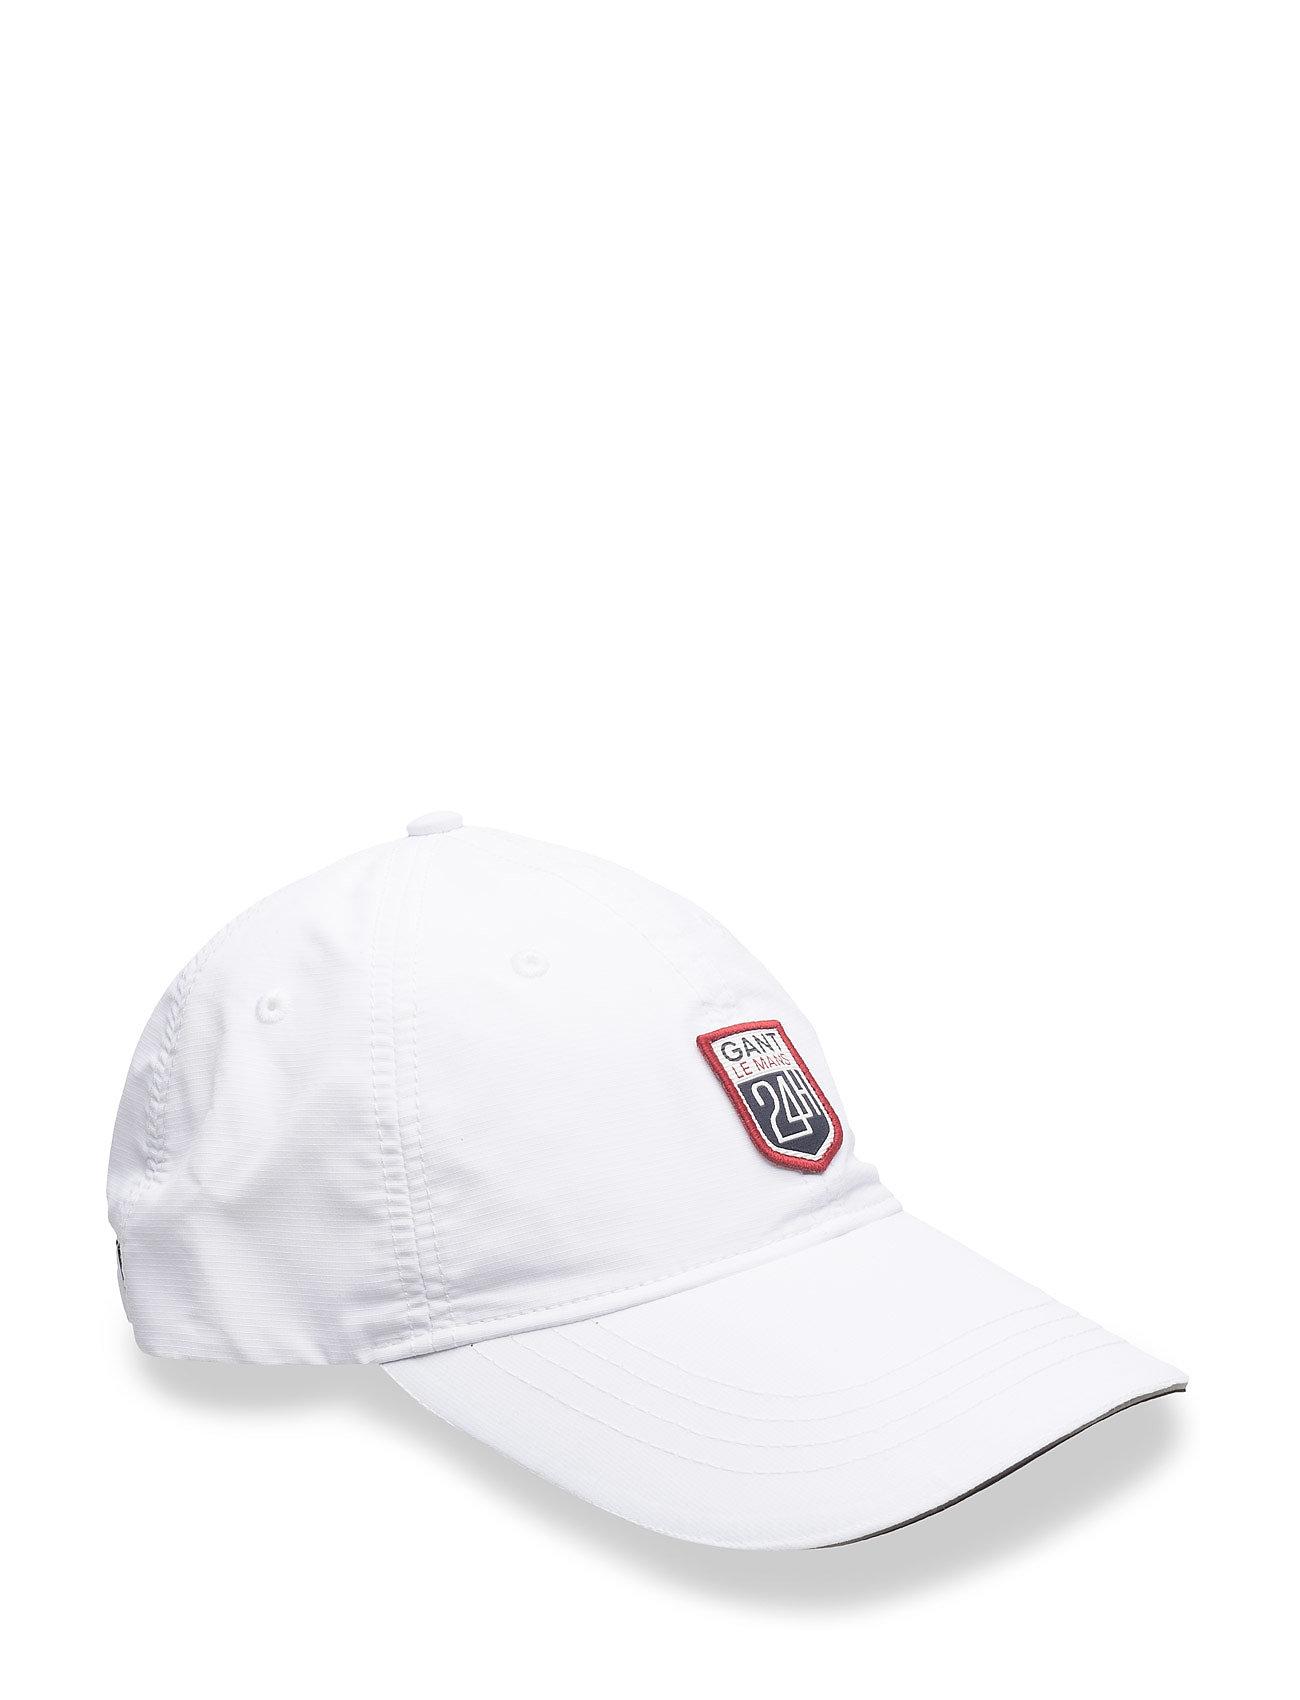 Lm. Nylon Cap GANT Hatte & Caps til Herrer i hvid